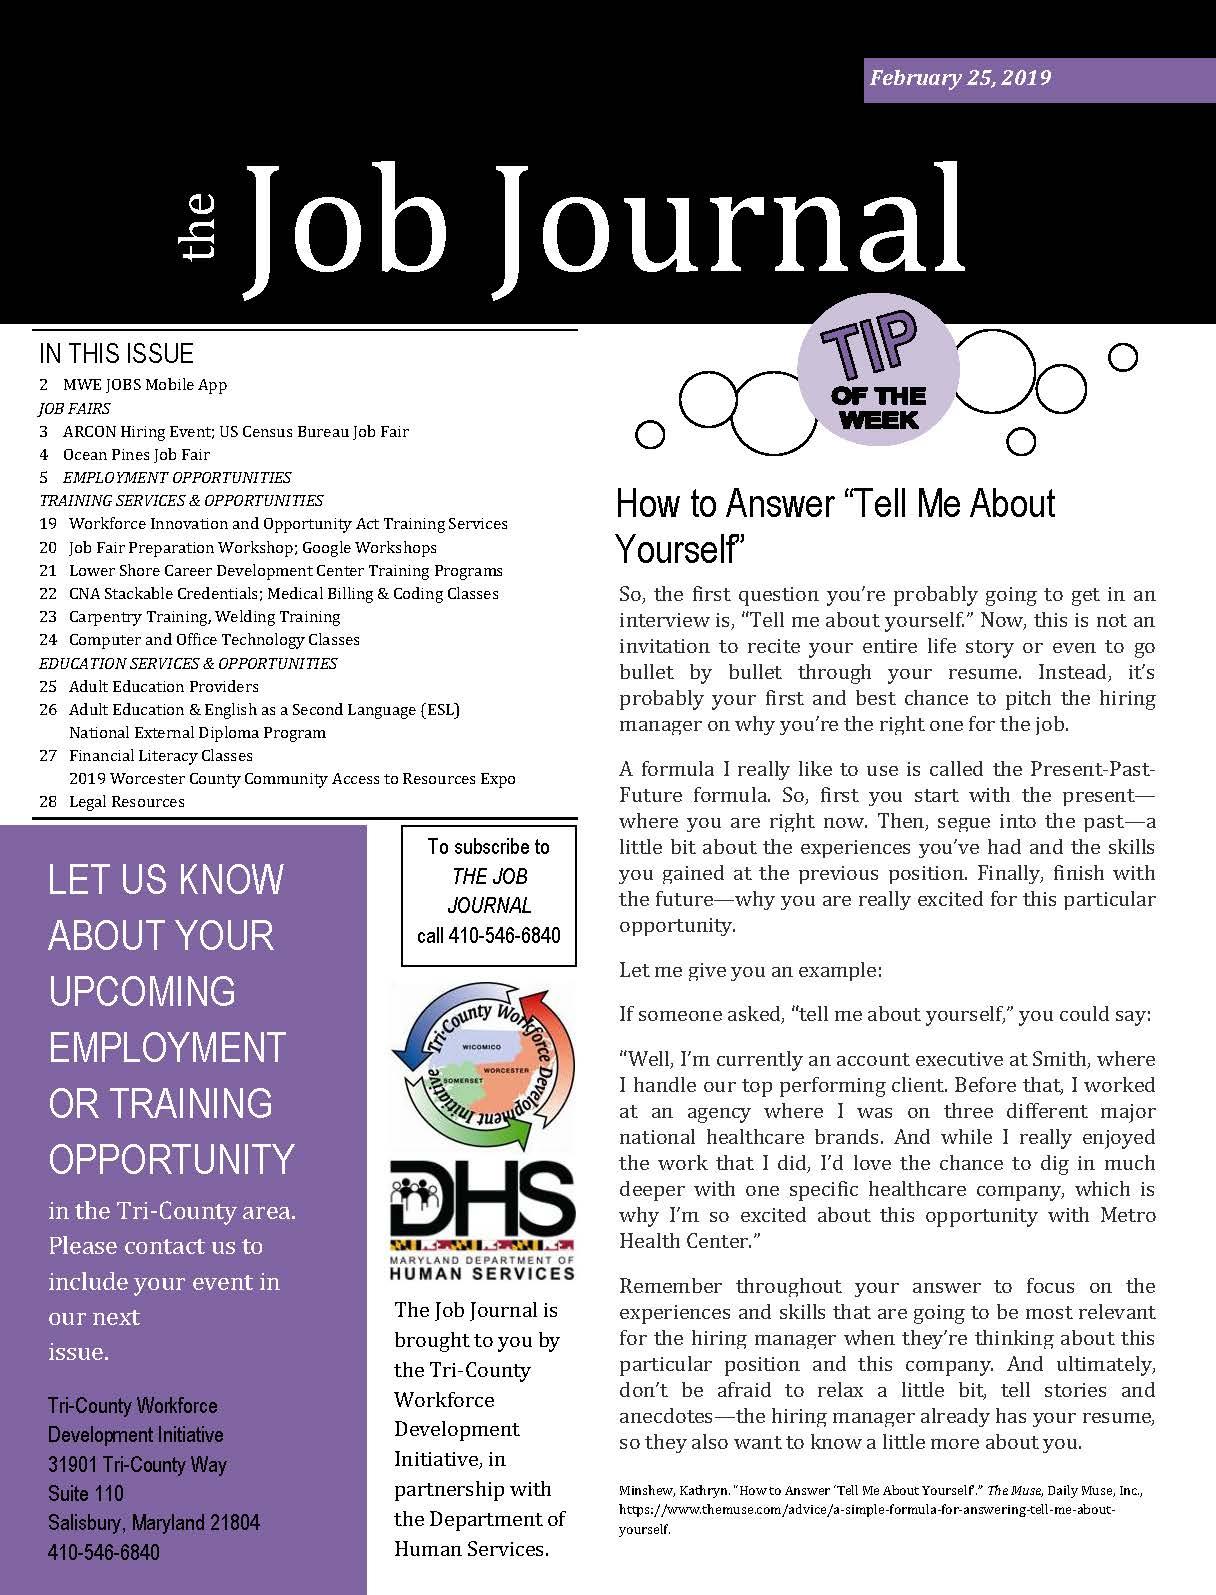 The Job Journal Feb. 25, 2019